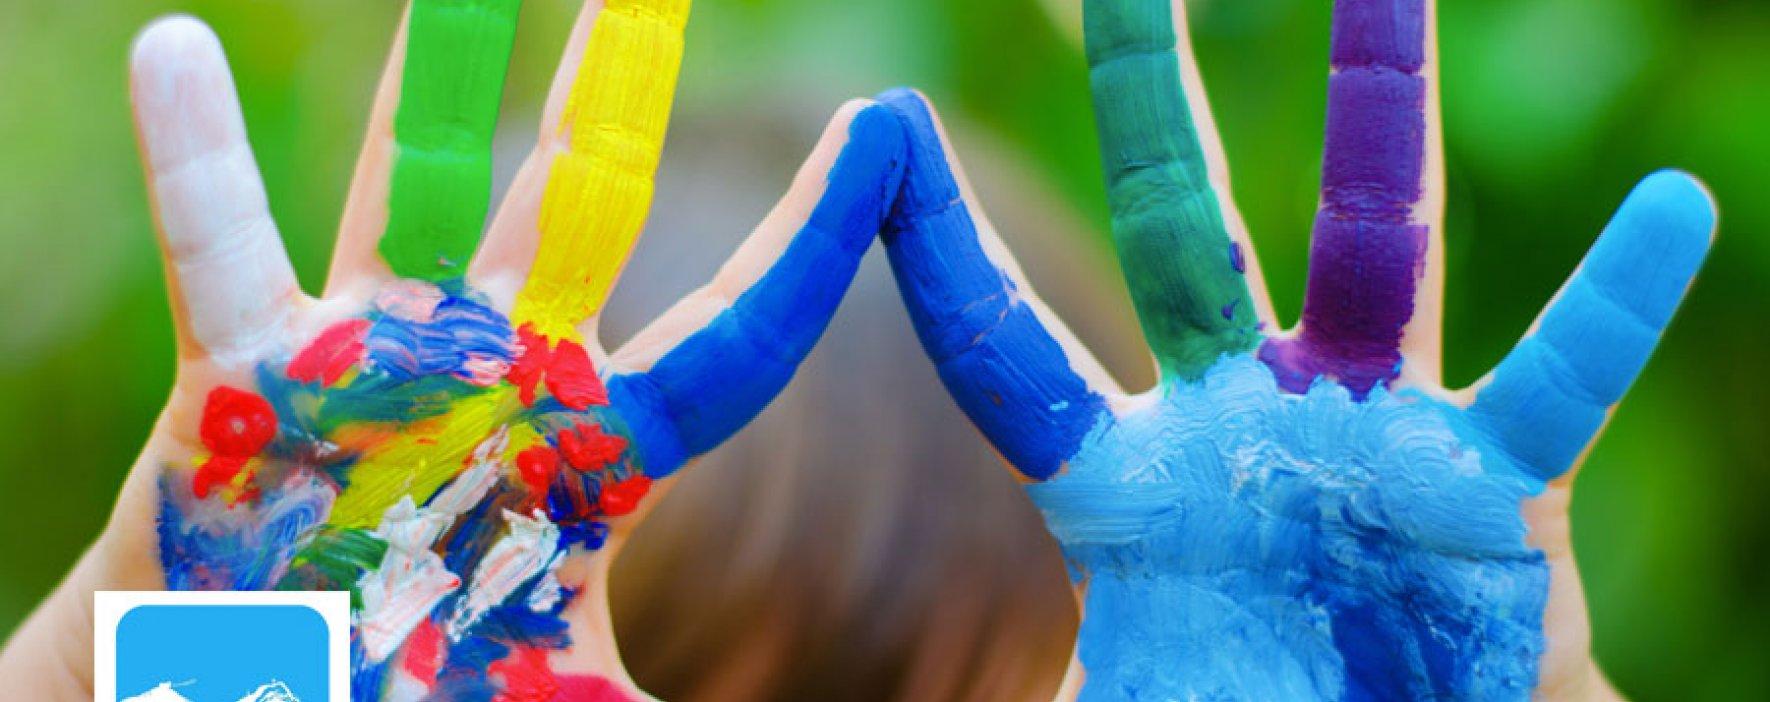 Inscripciones para el VII Concurso de Pintura Infantil